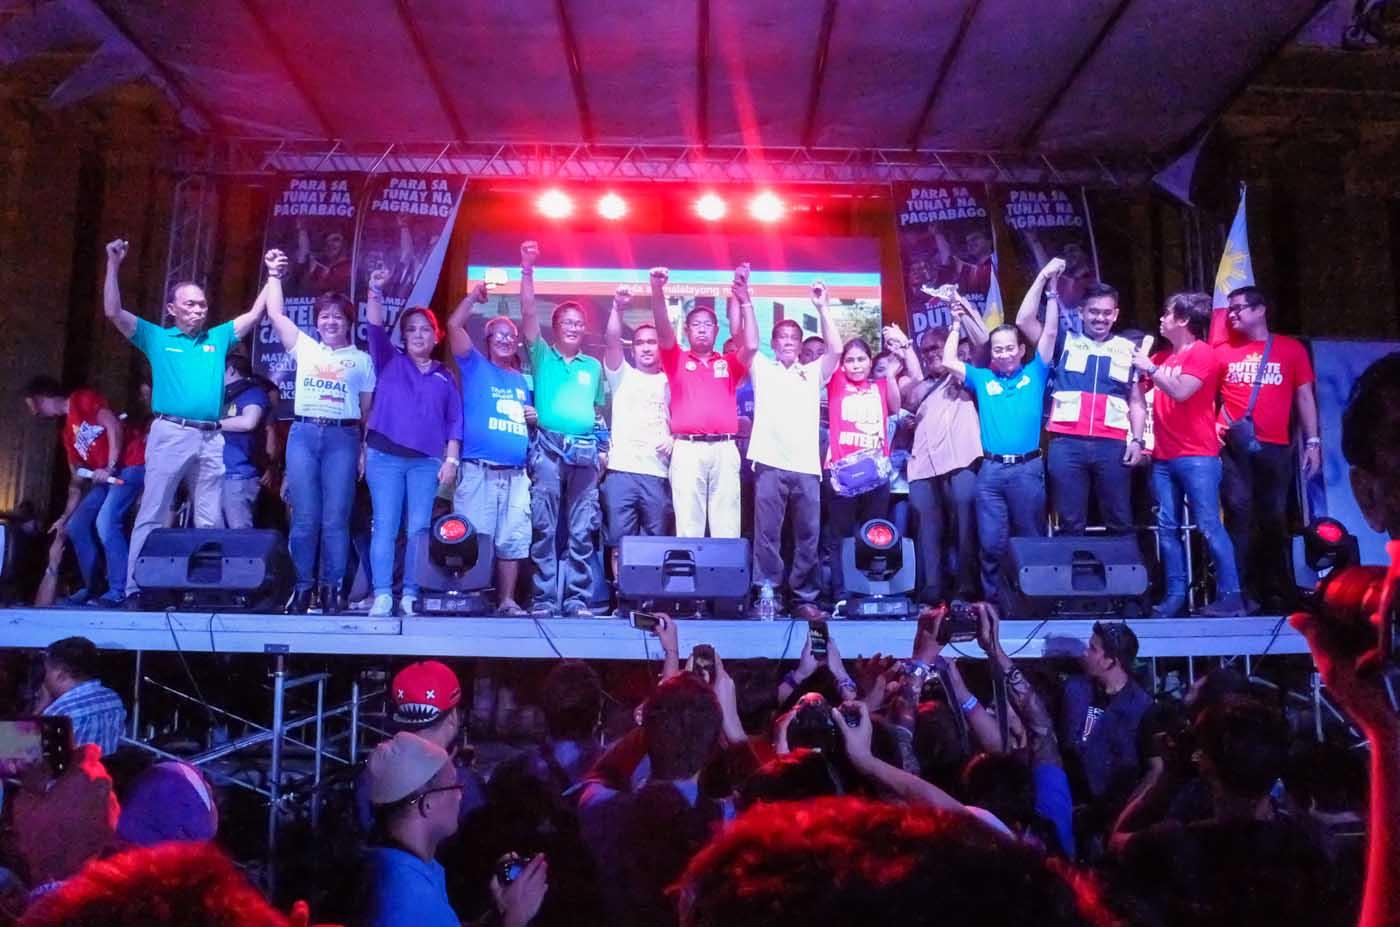 DUTERTE IN MANILA. Duterte poses with Manila officials and senatorial candidates on stage at Liwasang Bonifacio, Manila. Photo by Alecs Ongcal/Rappler